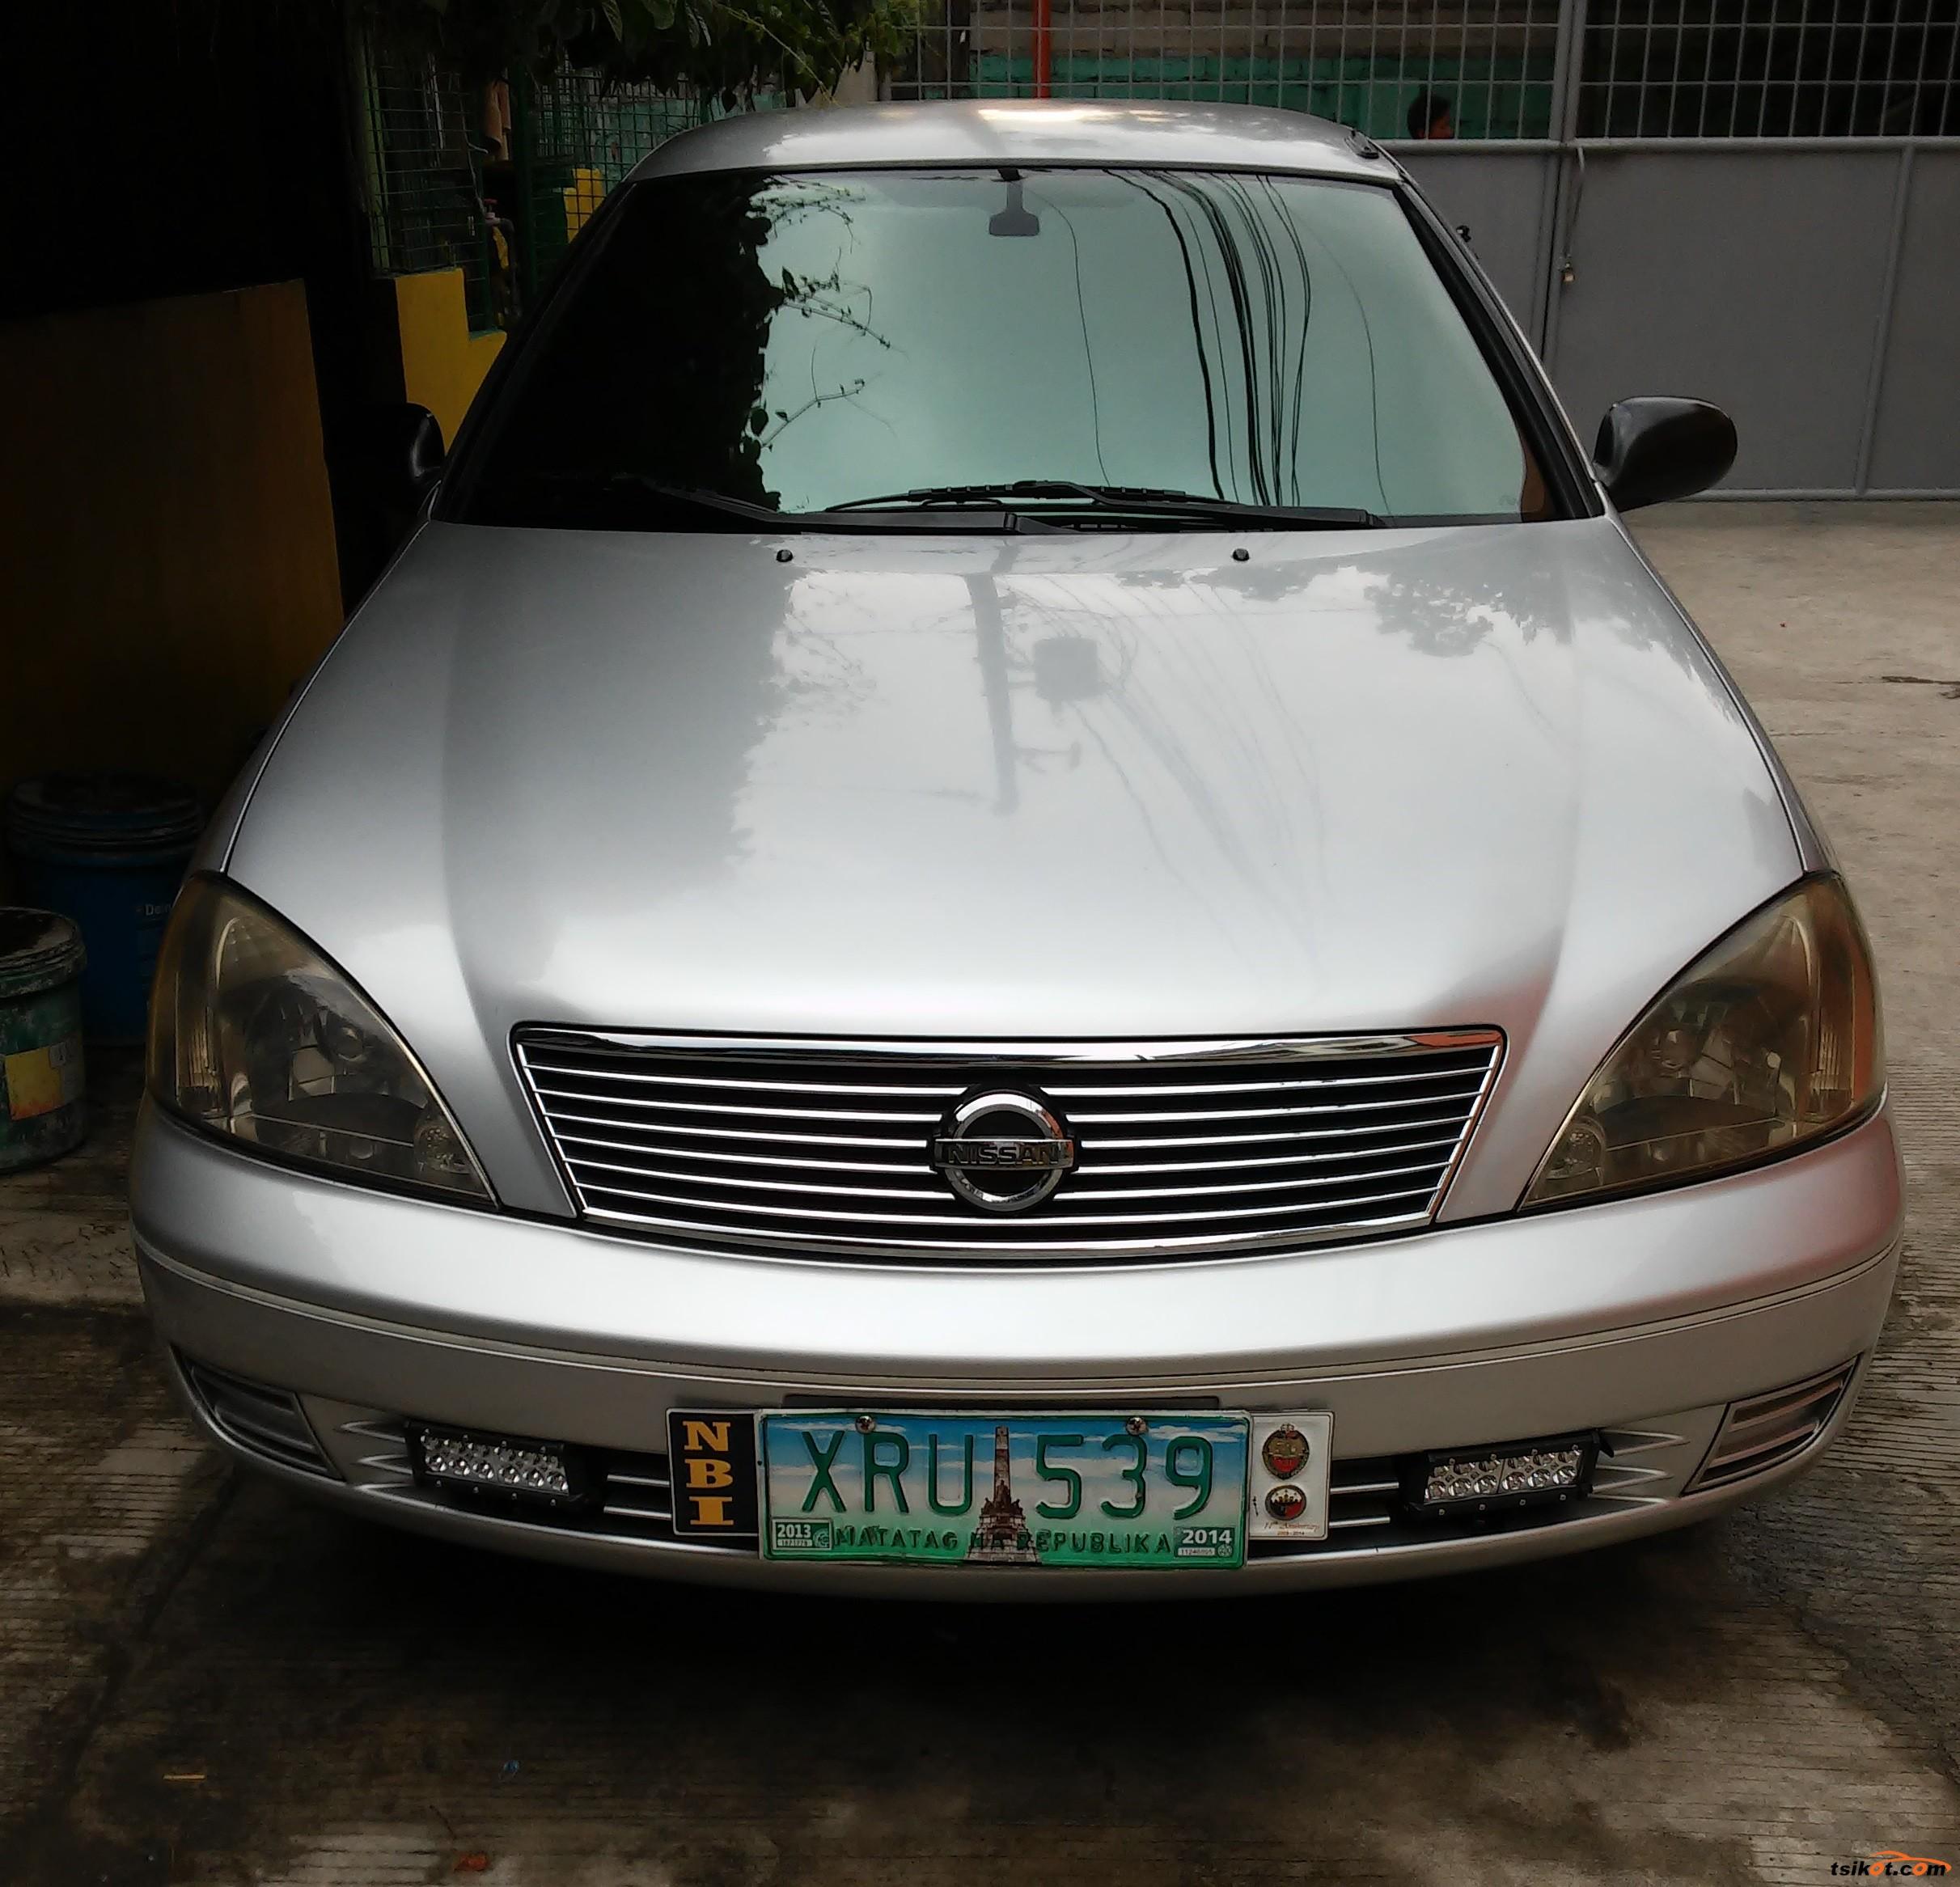 Nissan Sentra 2004 - 4